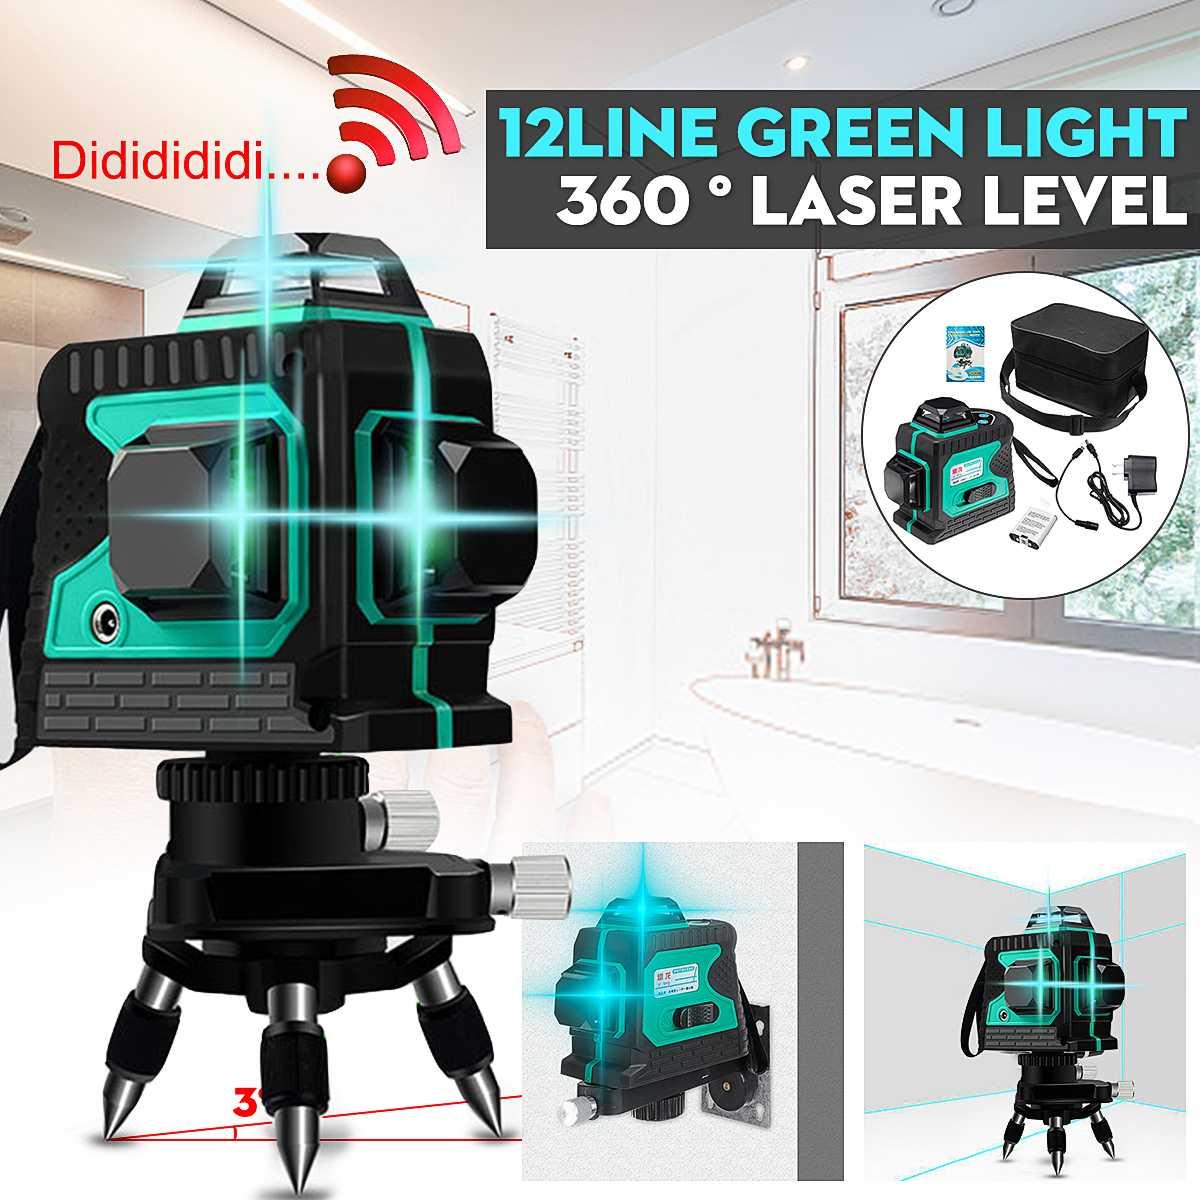 12 Line Laser Level Green Self Leveling 3D 360° Rotary Cross Measure Tool Tripod